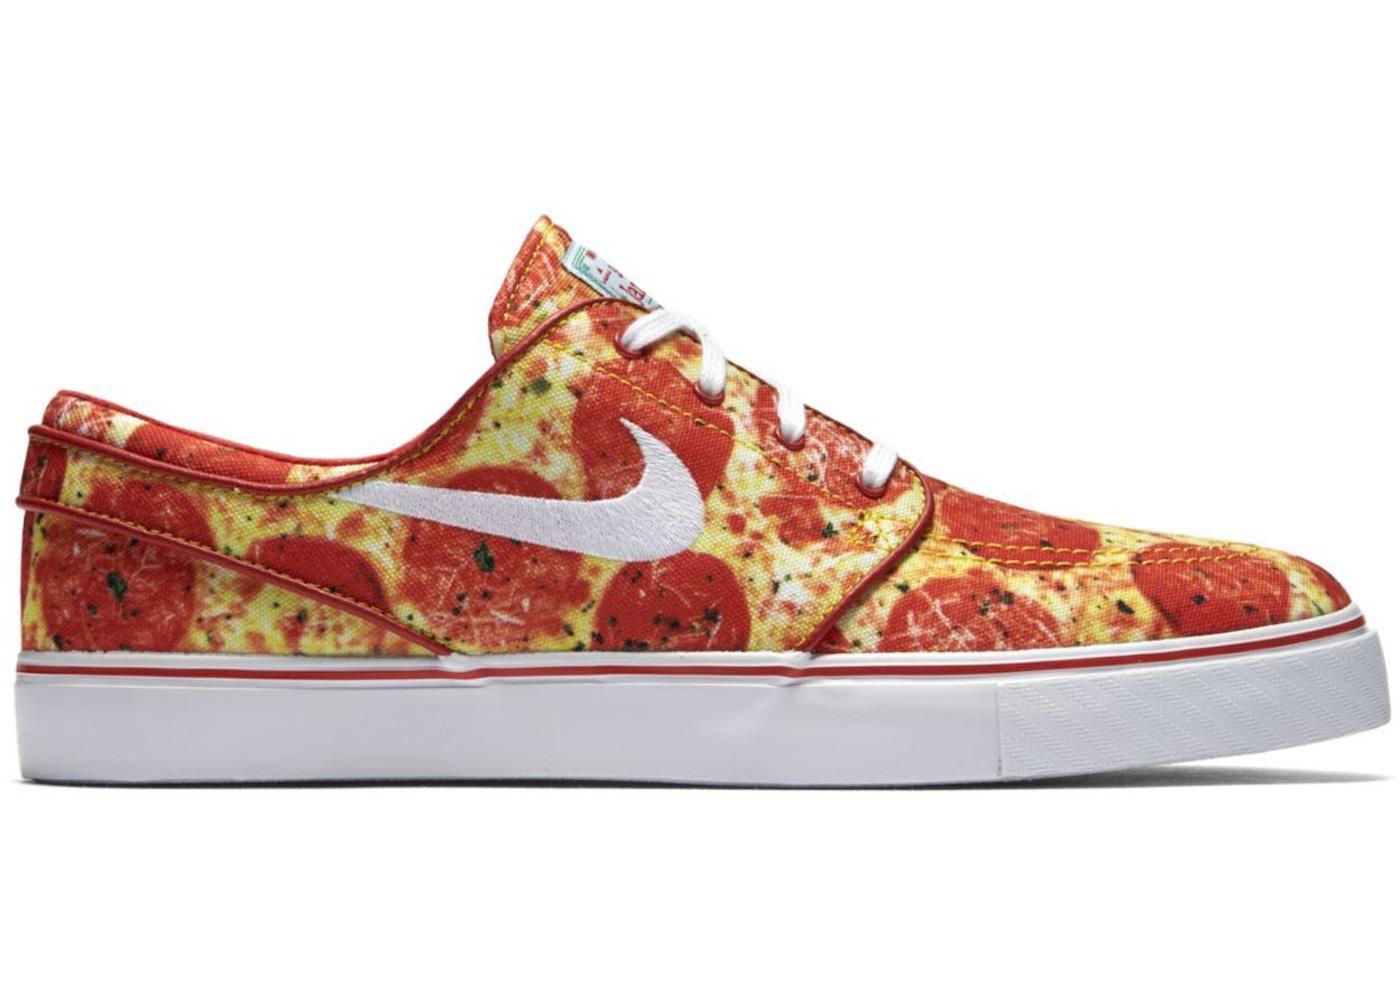 sports shoes e318d 64a14 Nike SB Stefan Janoski Skate Mental Pepperoni Pizza